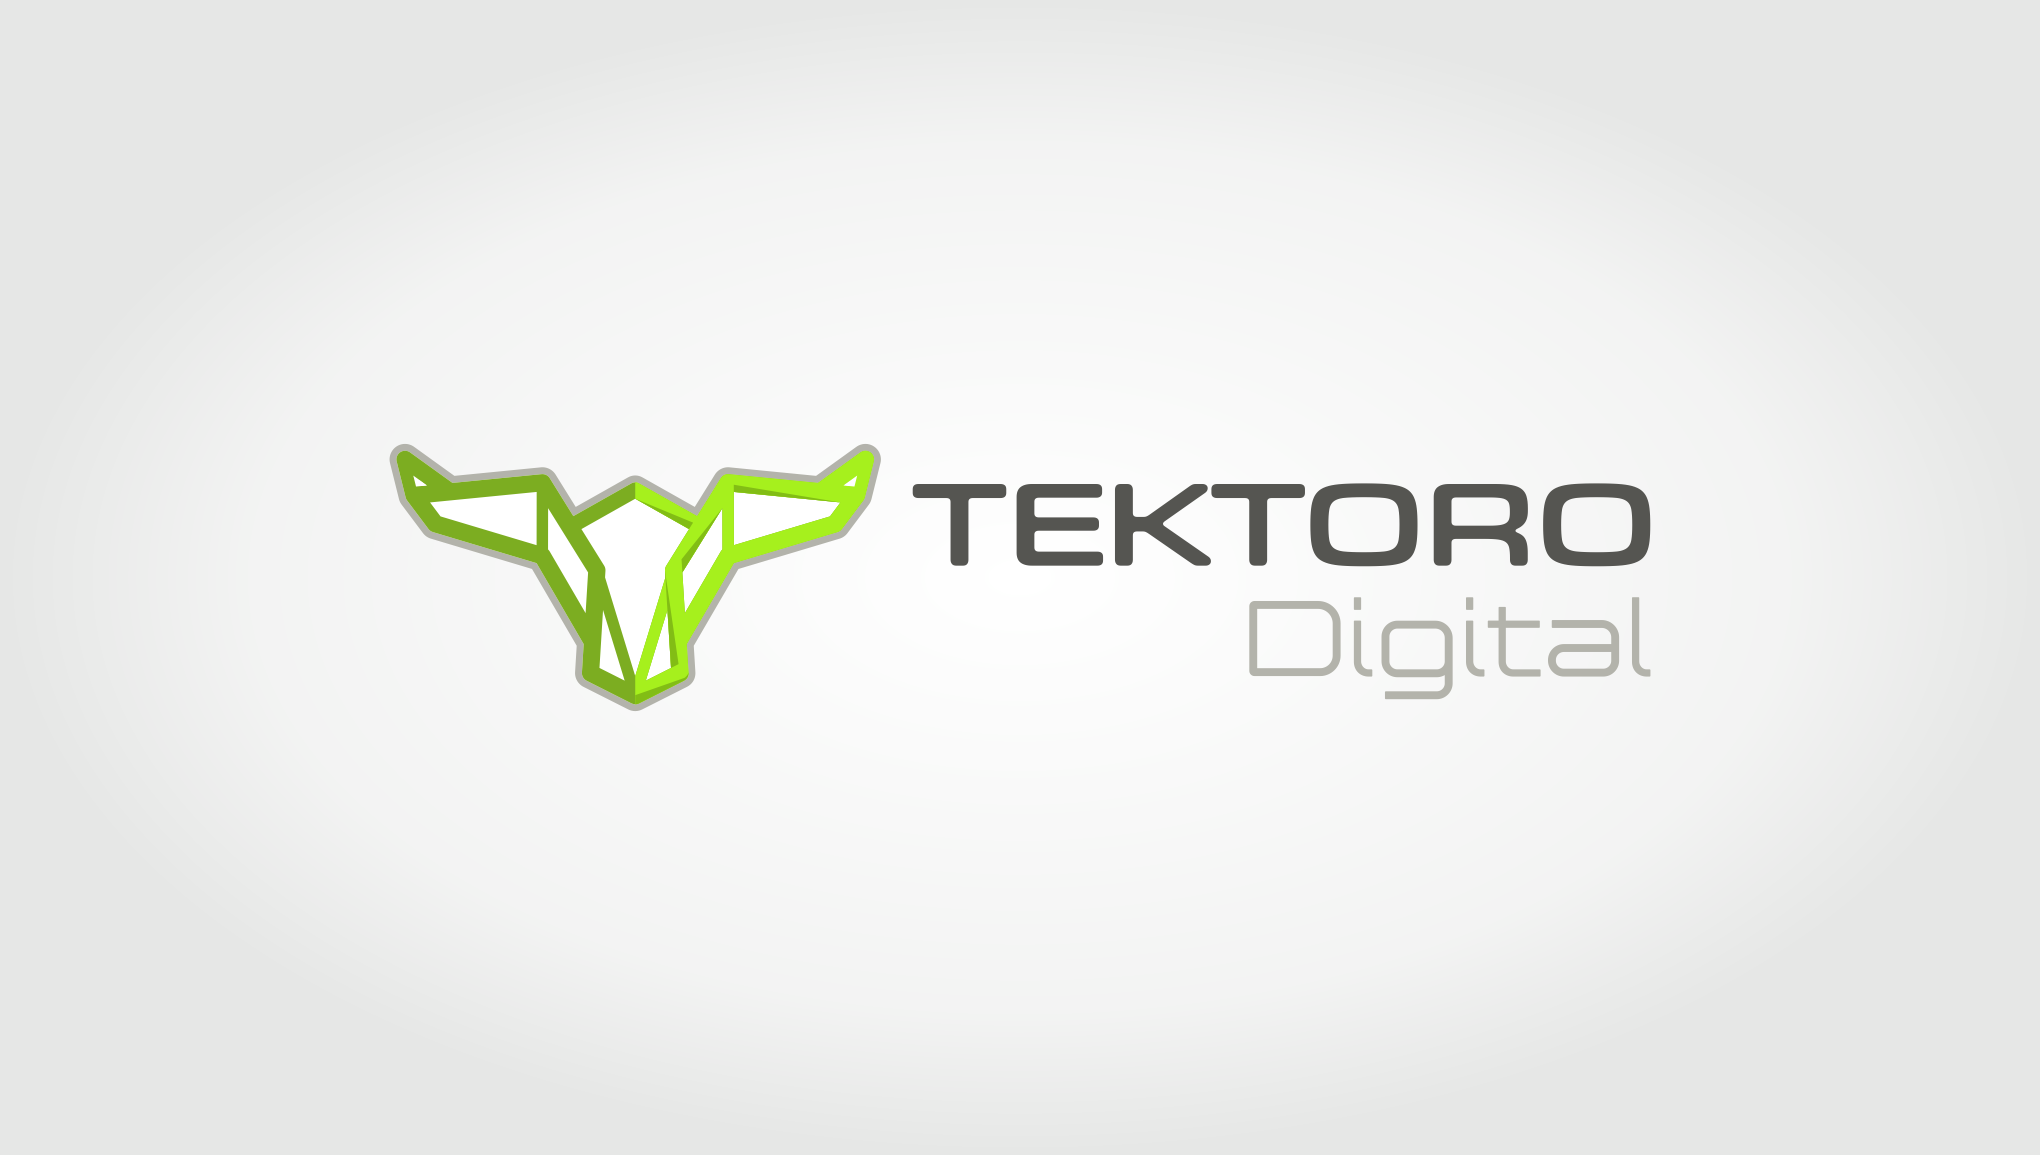 TekToro Digital Marketing needs a professional new logo.